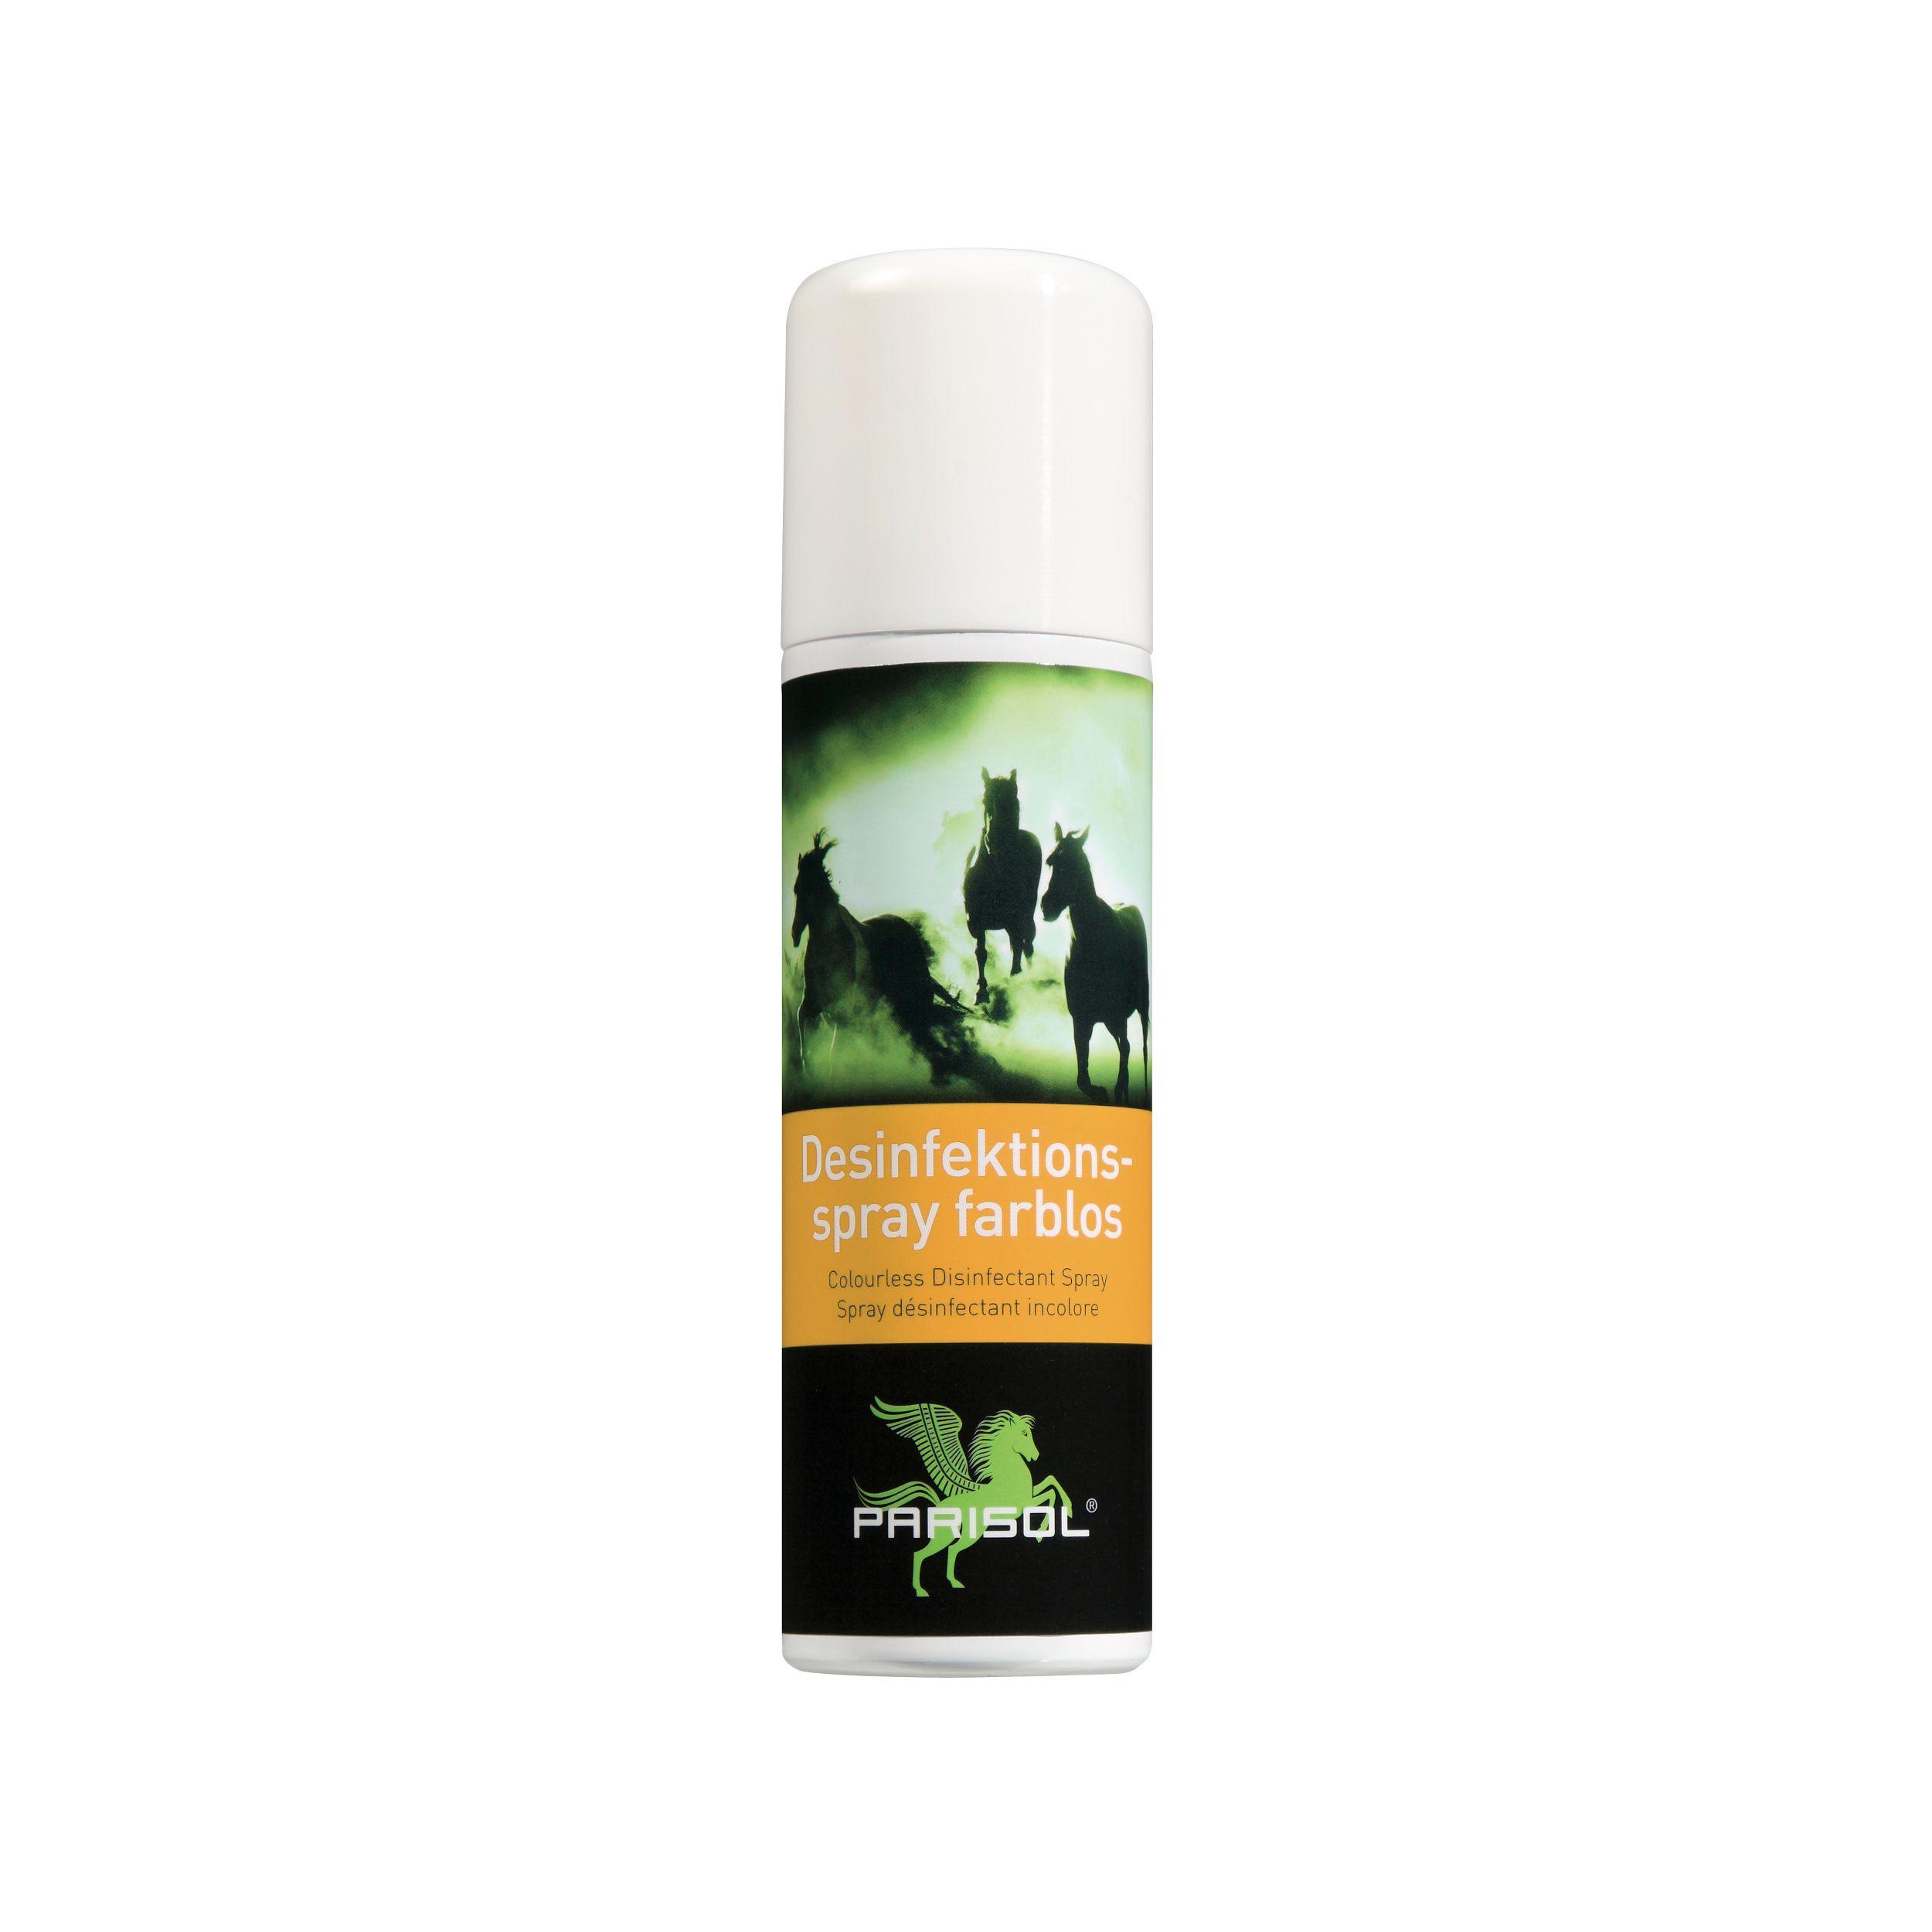 Parisol Desinfektionsspray farblos 200ml